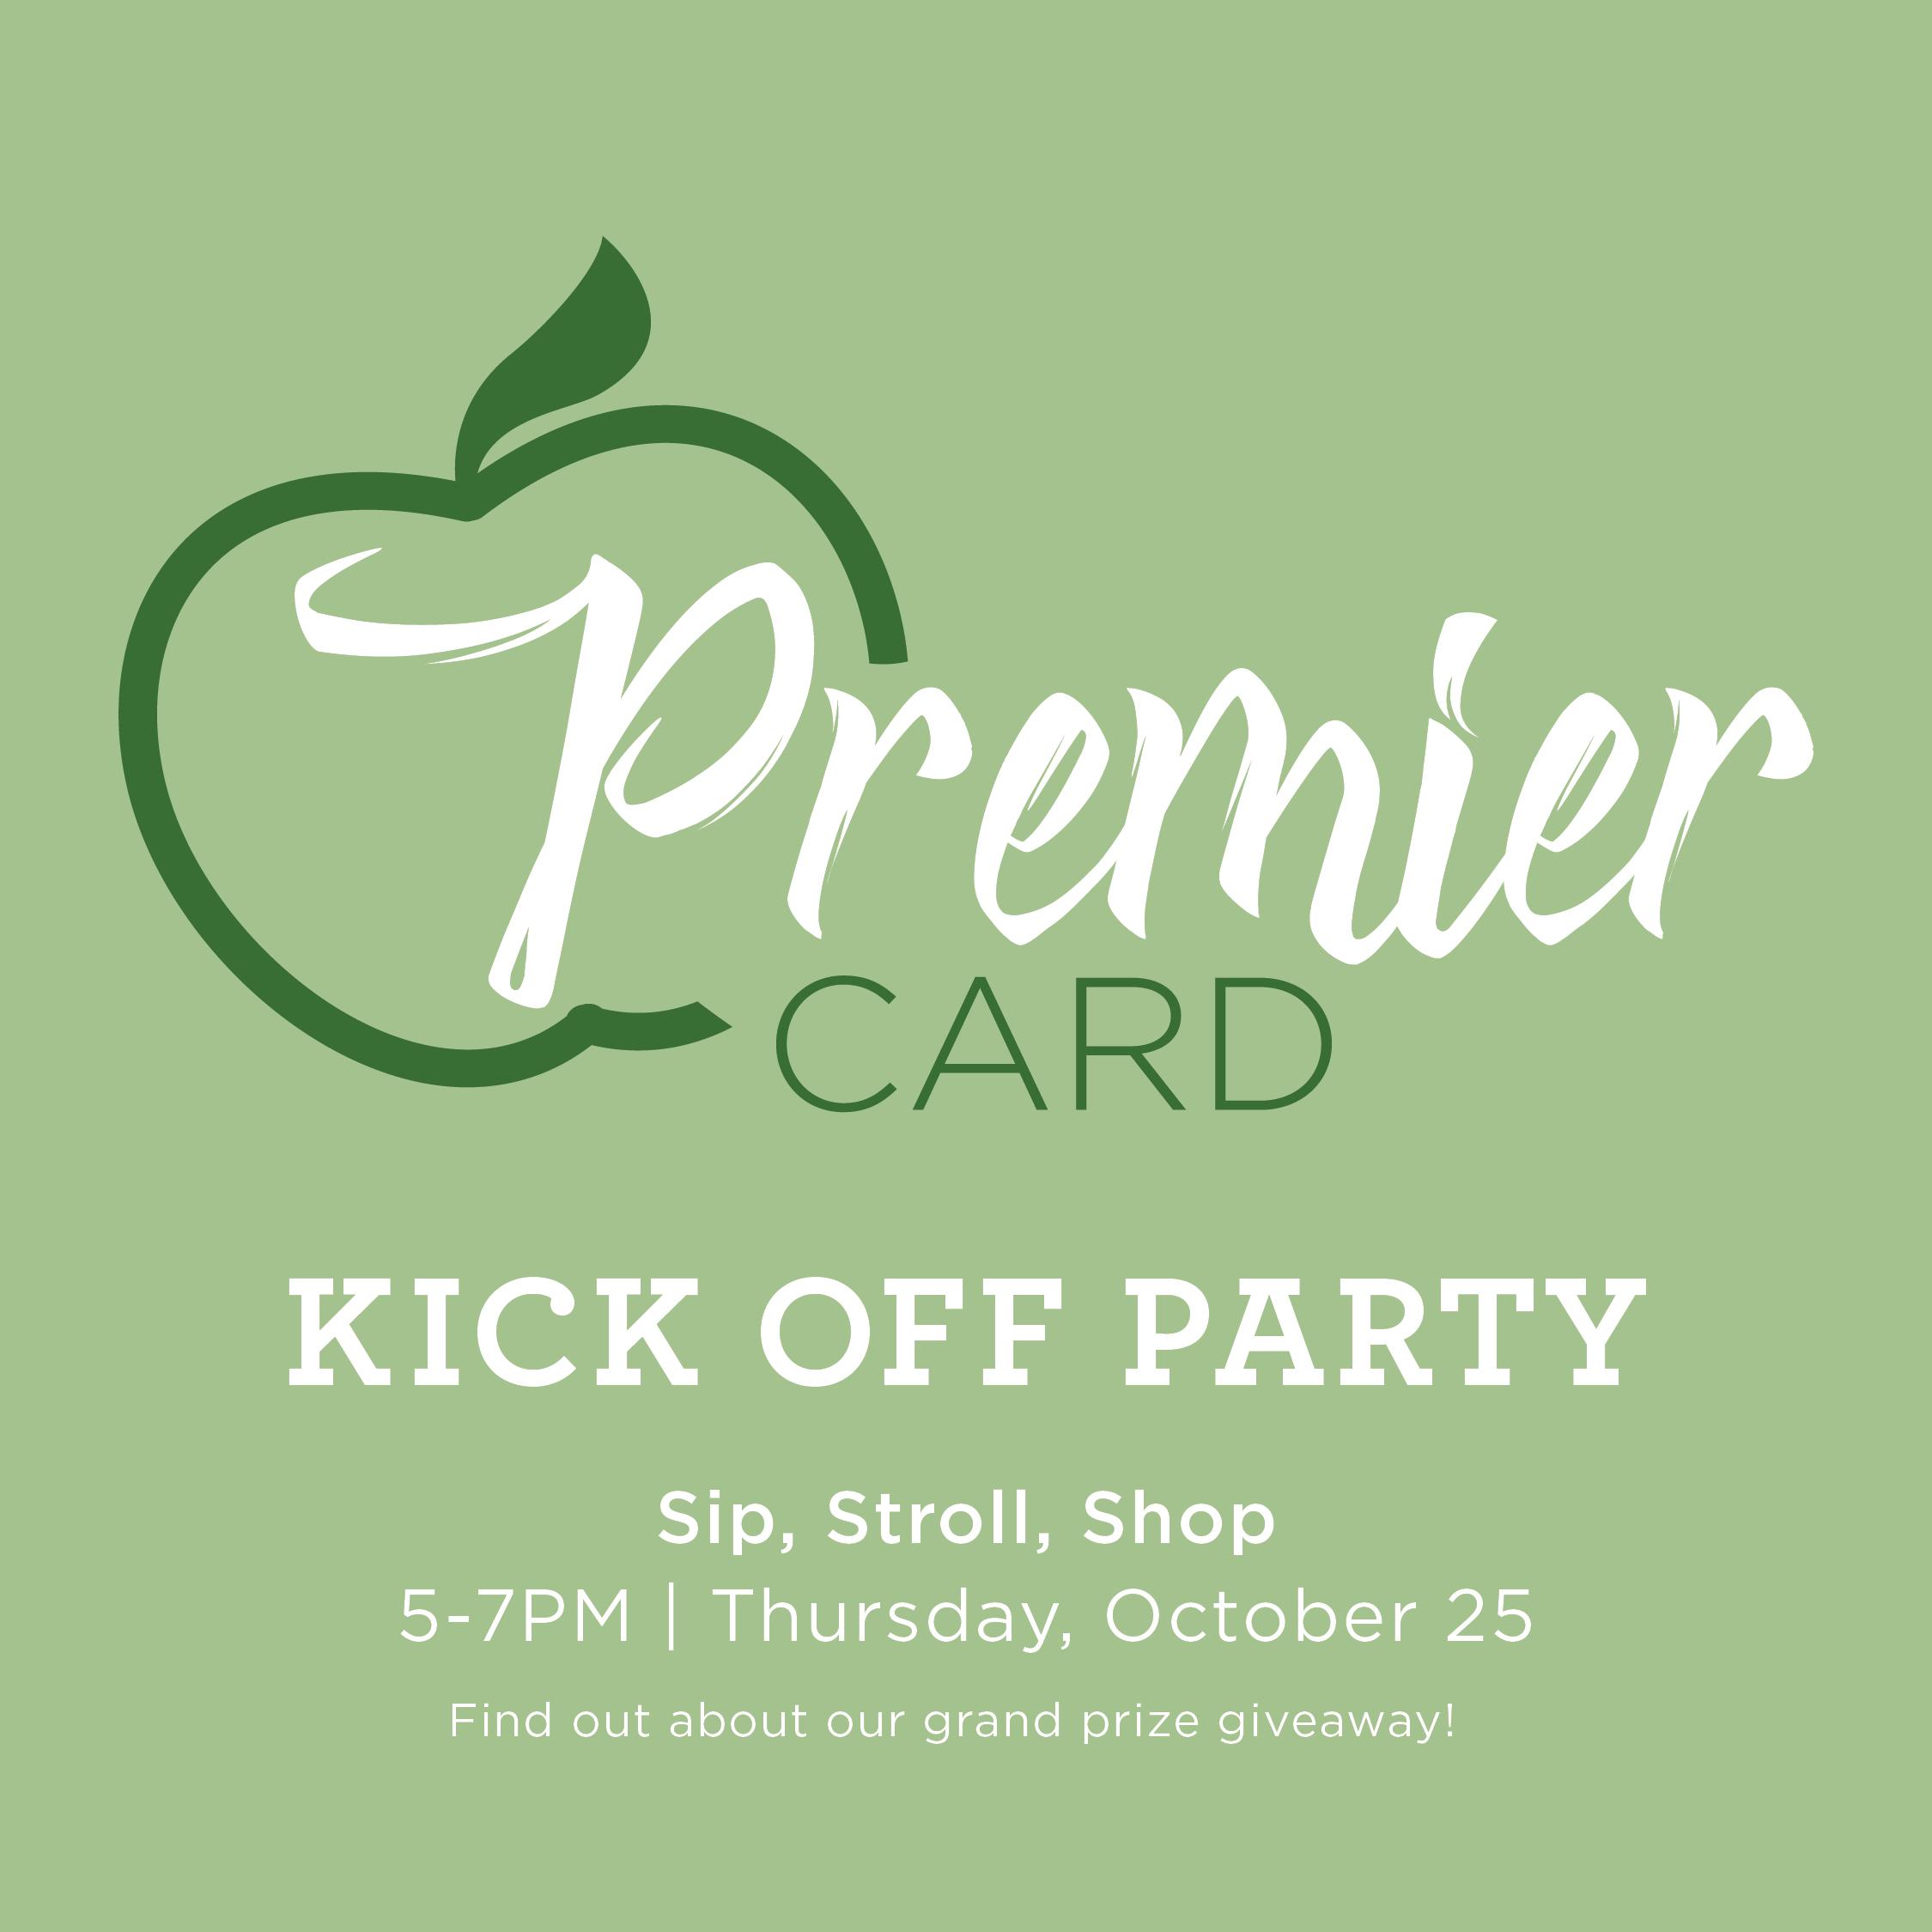 Premier Card Social Post.jpg